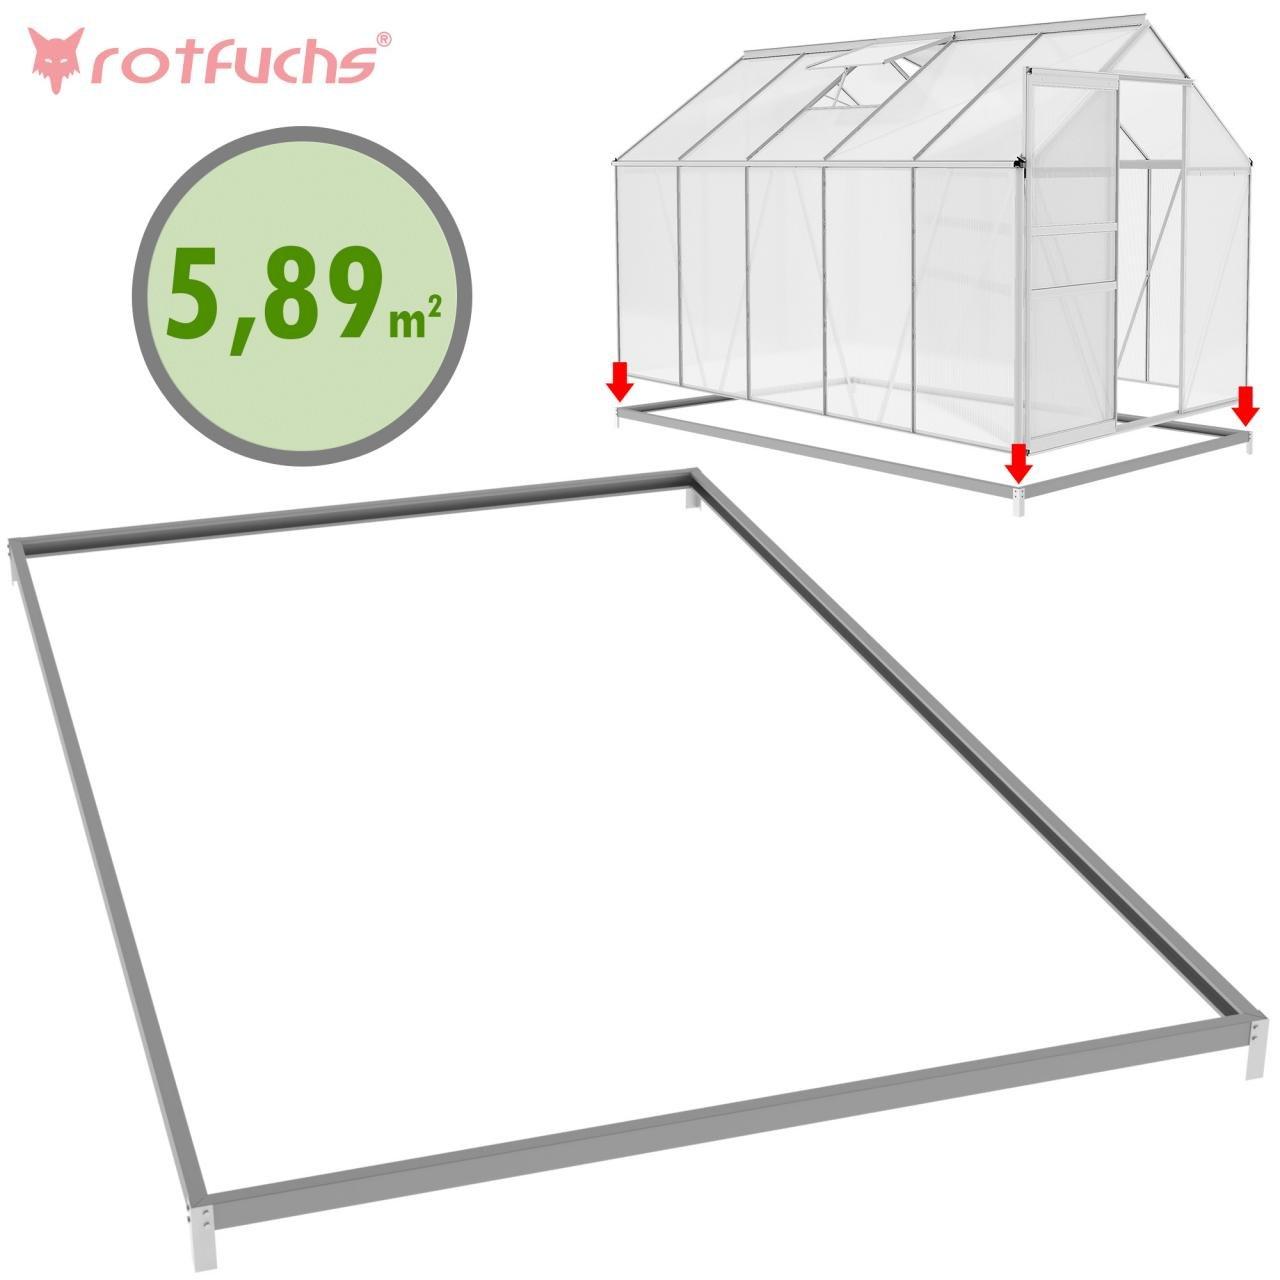 Rotfuchs/® GH03.ACCES01 Fundament f/ür Gew/ächshaus 3,61 m/² 1,90 m x 1,90 m